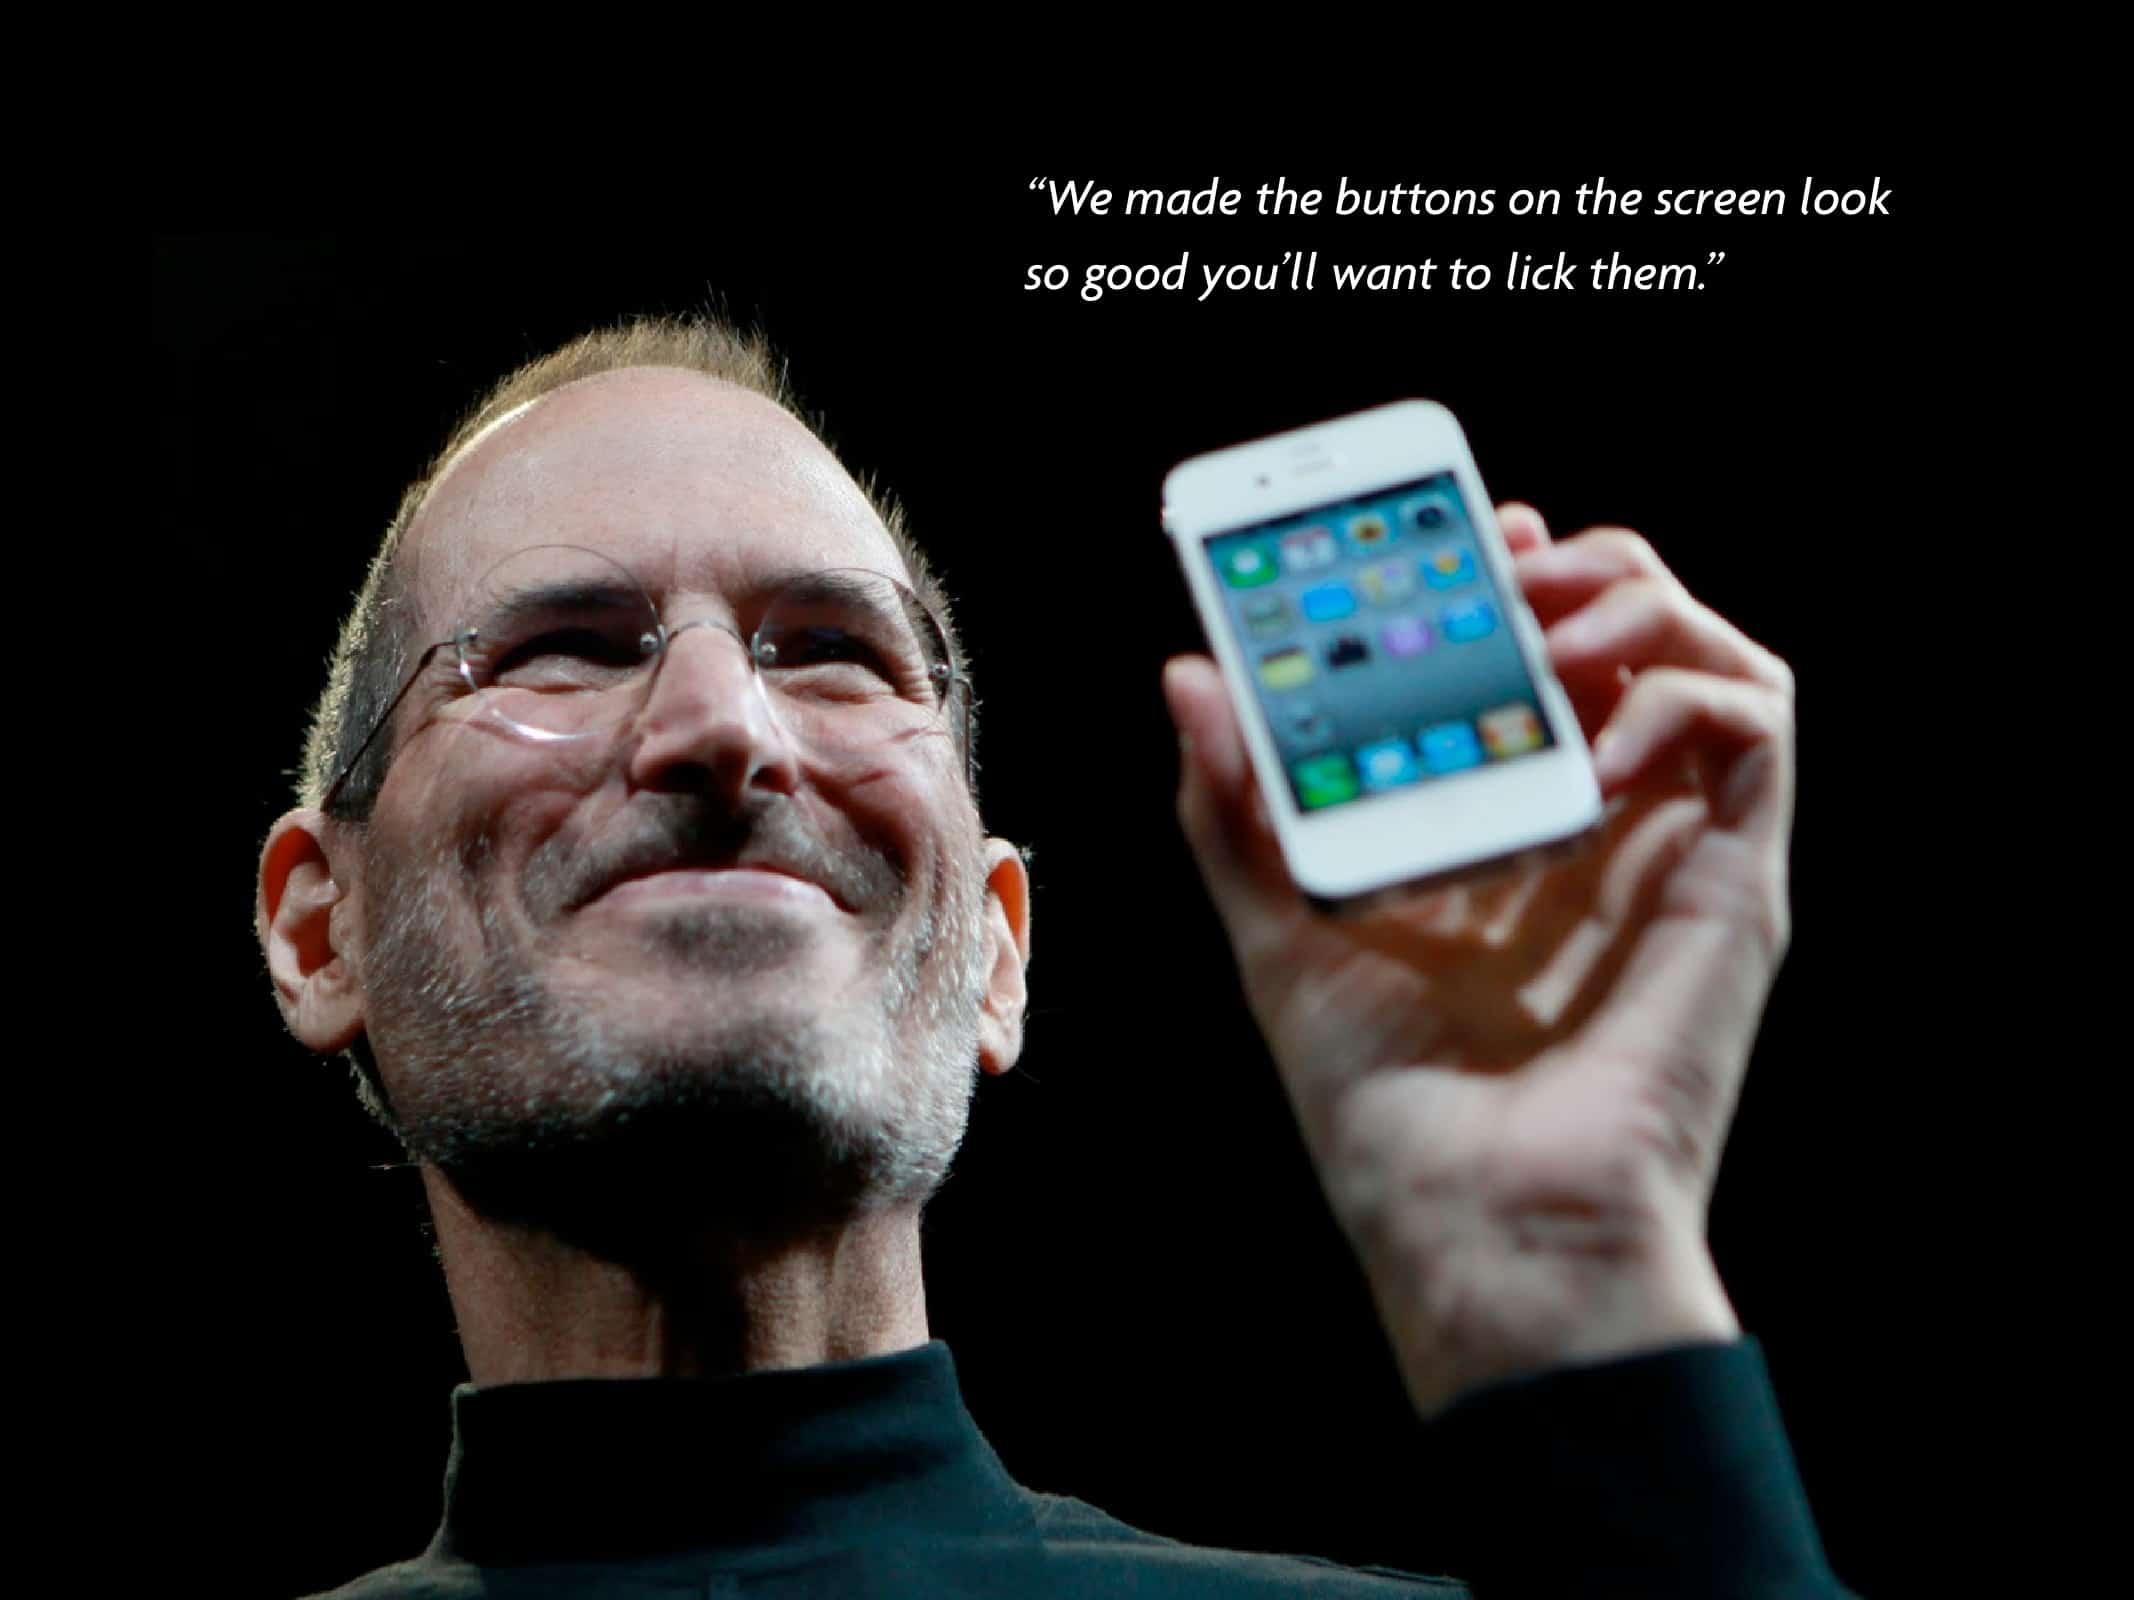 steve-jobs-quotes-creative-apple-design-10